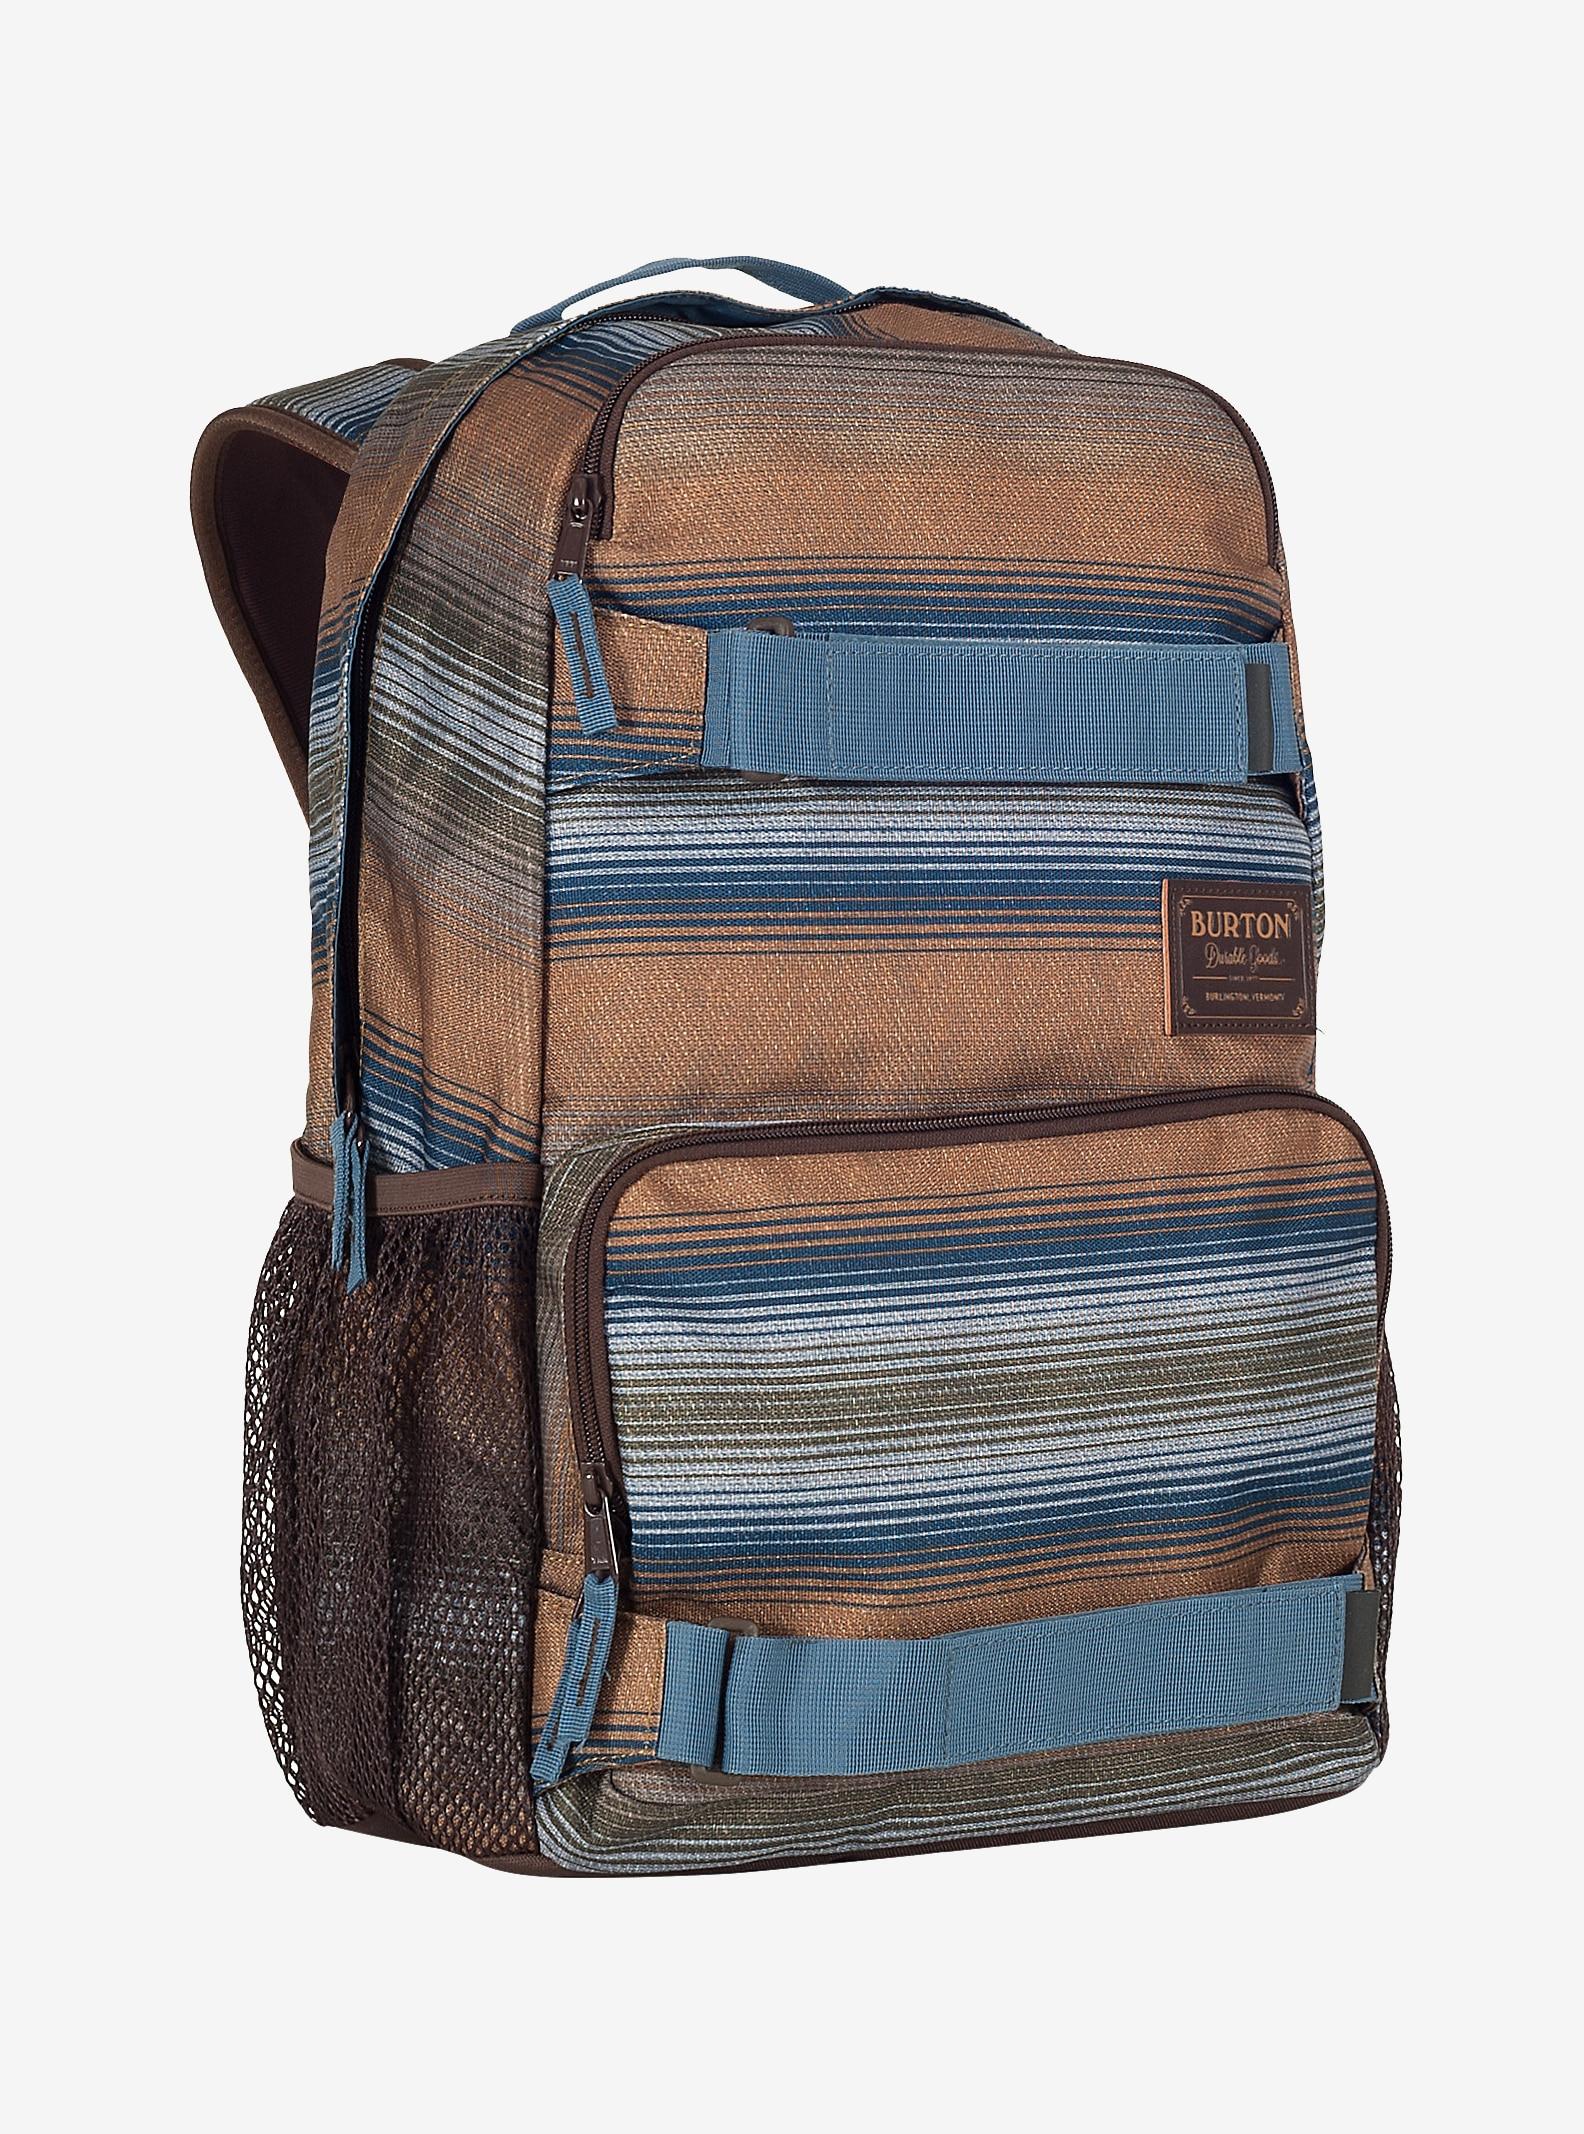 Burton Treble Yell Backpack shown in Beach Stripe Print